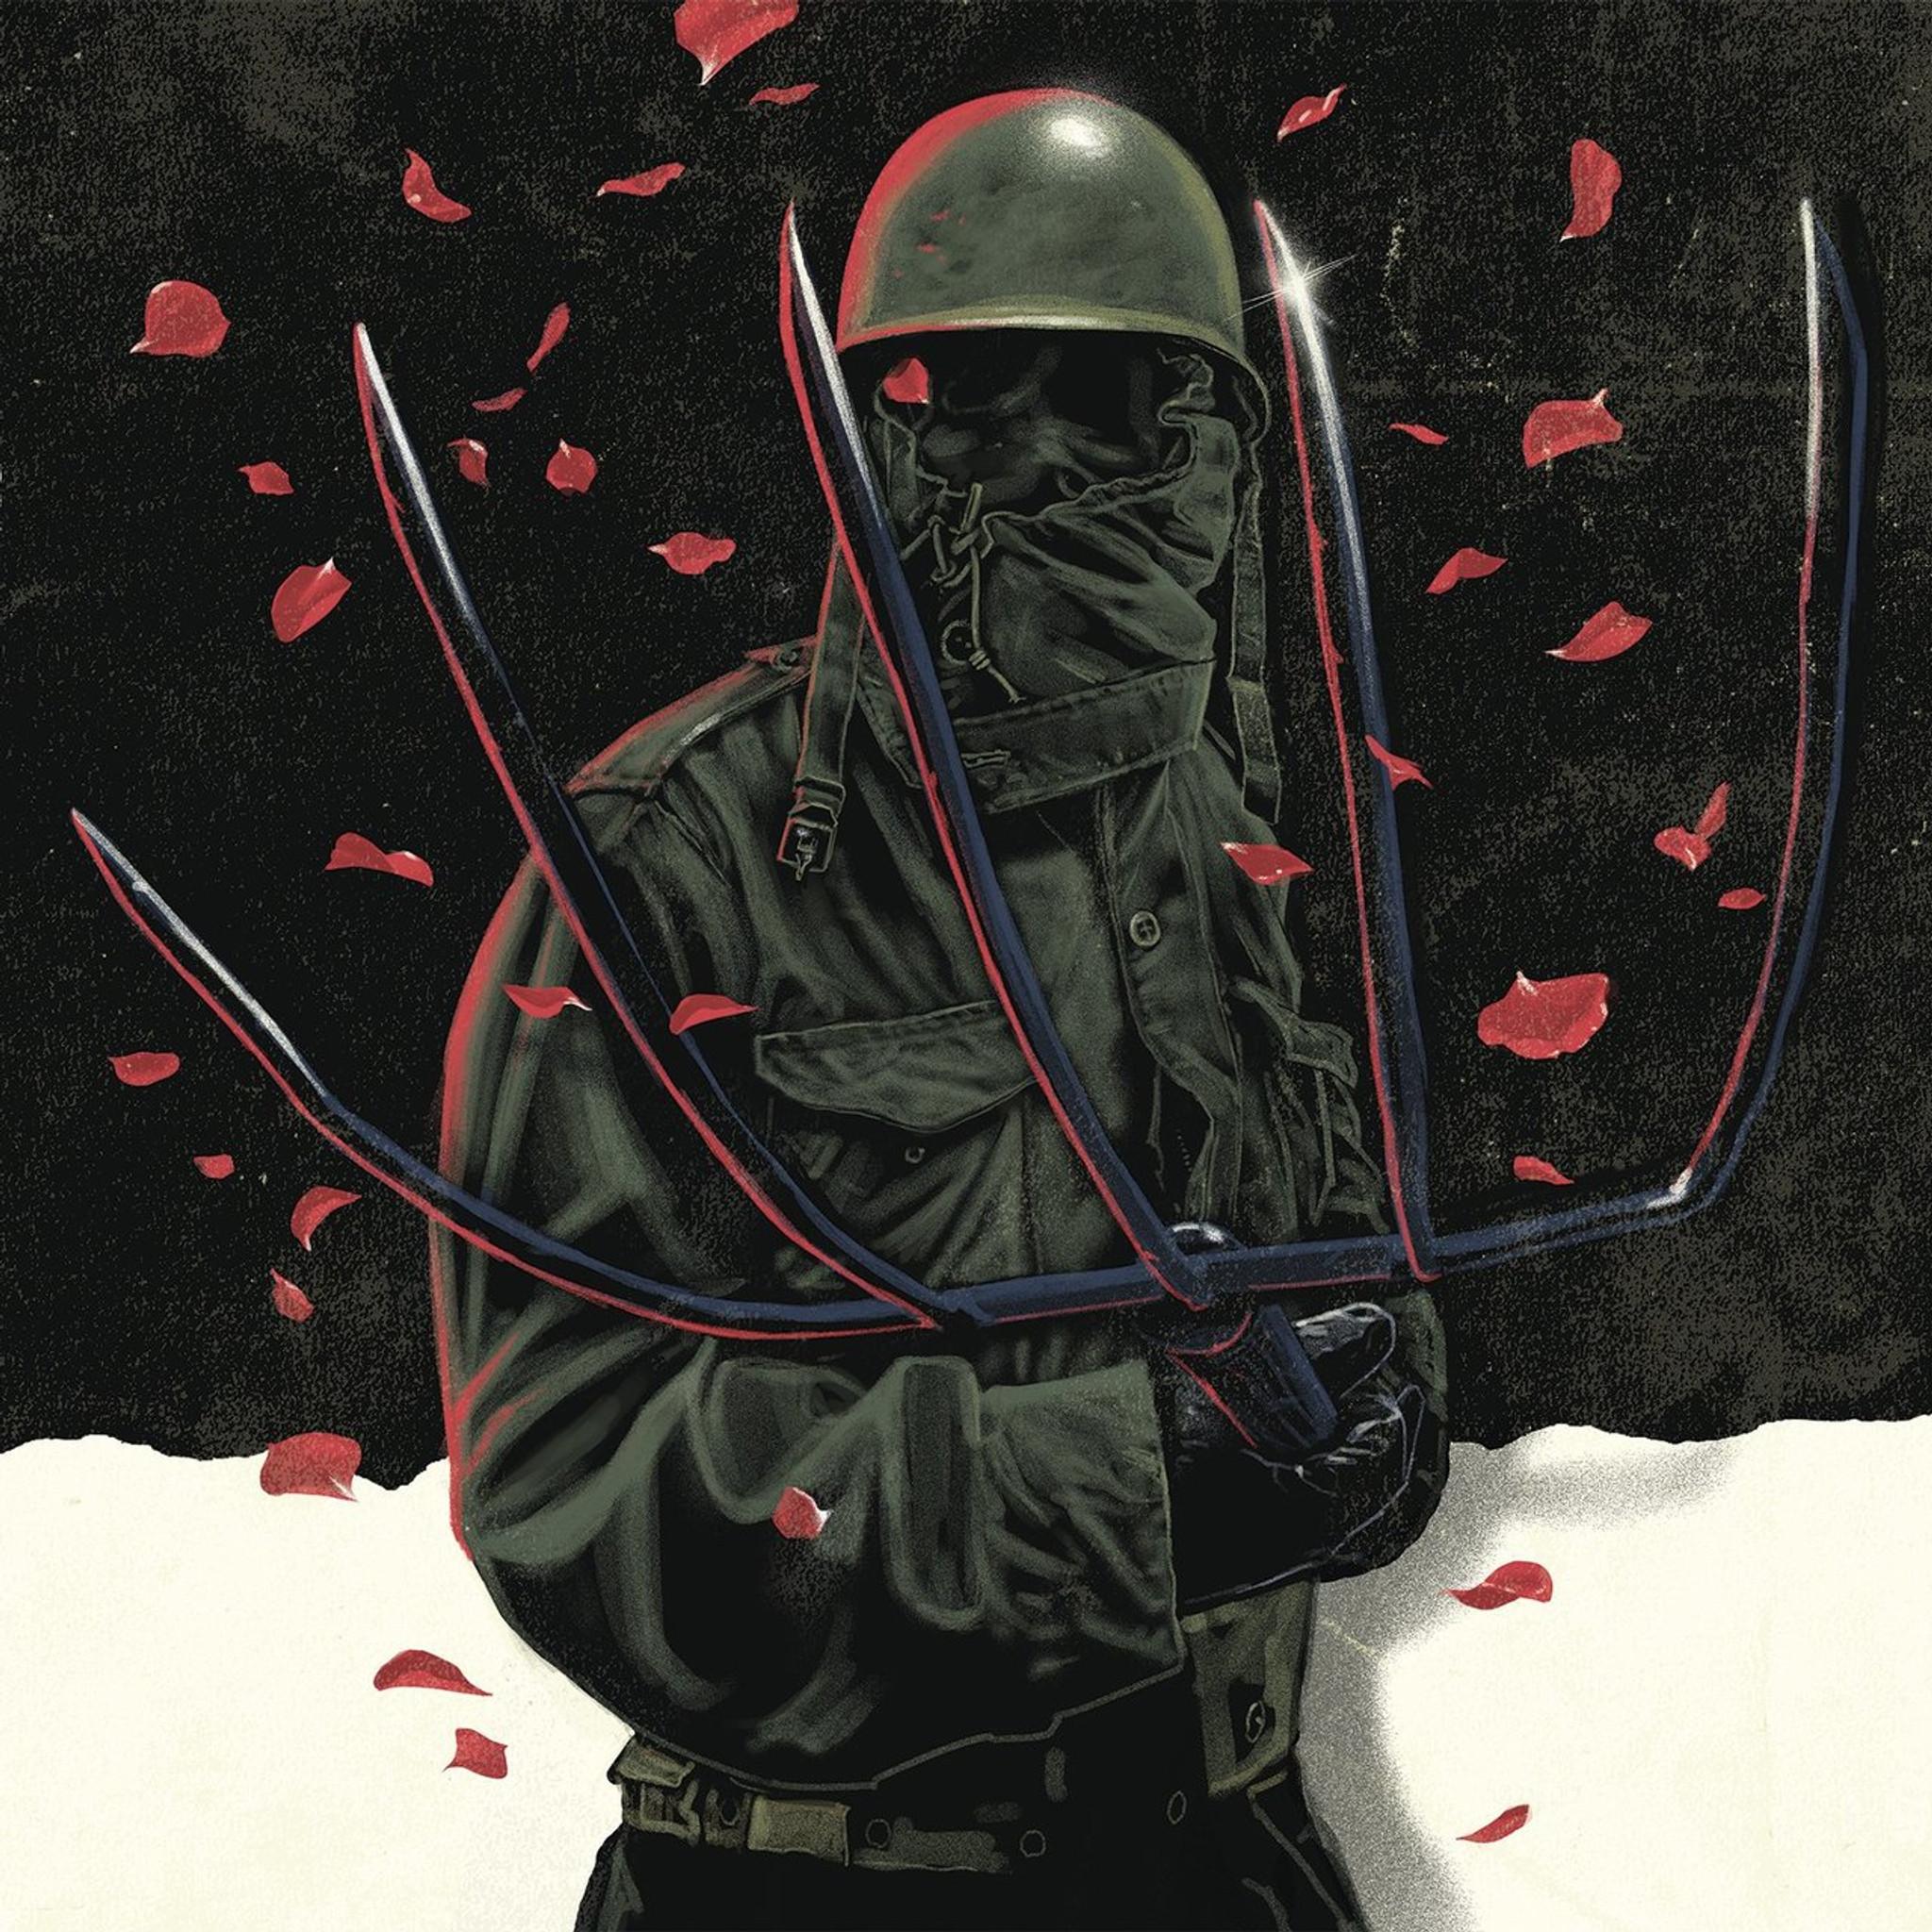 Richard Einhorn: The Prowler (Original Soundtrack) 2LP